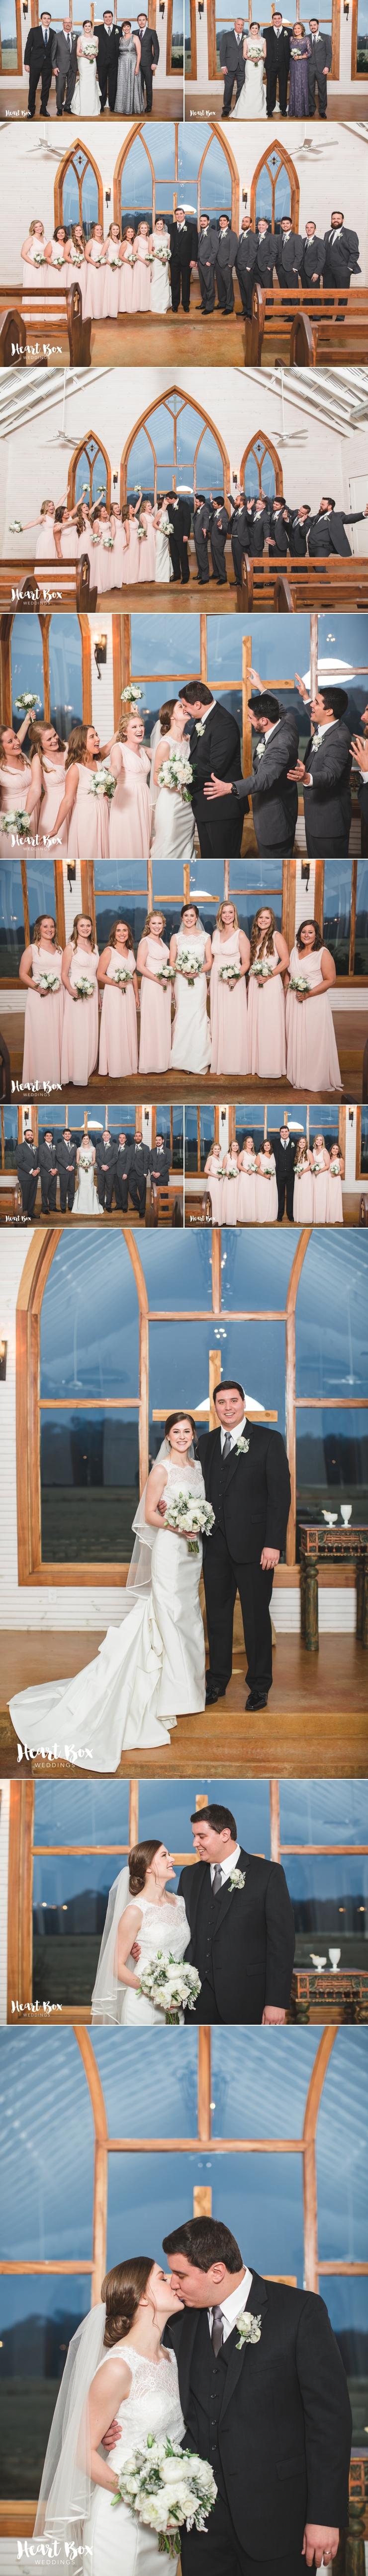 Matthews Wedding 9.jpg